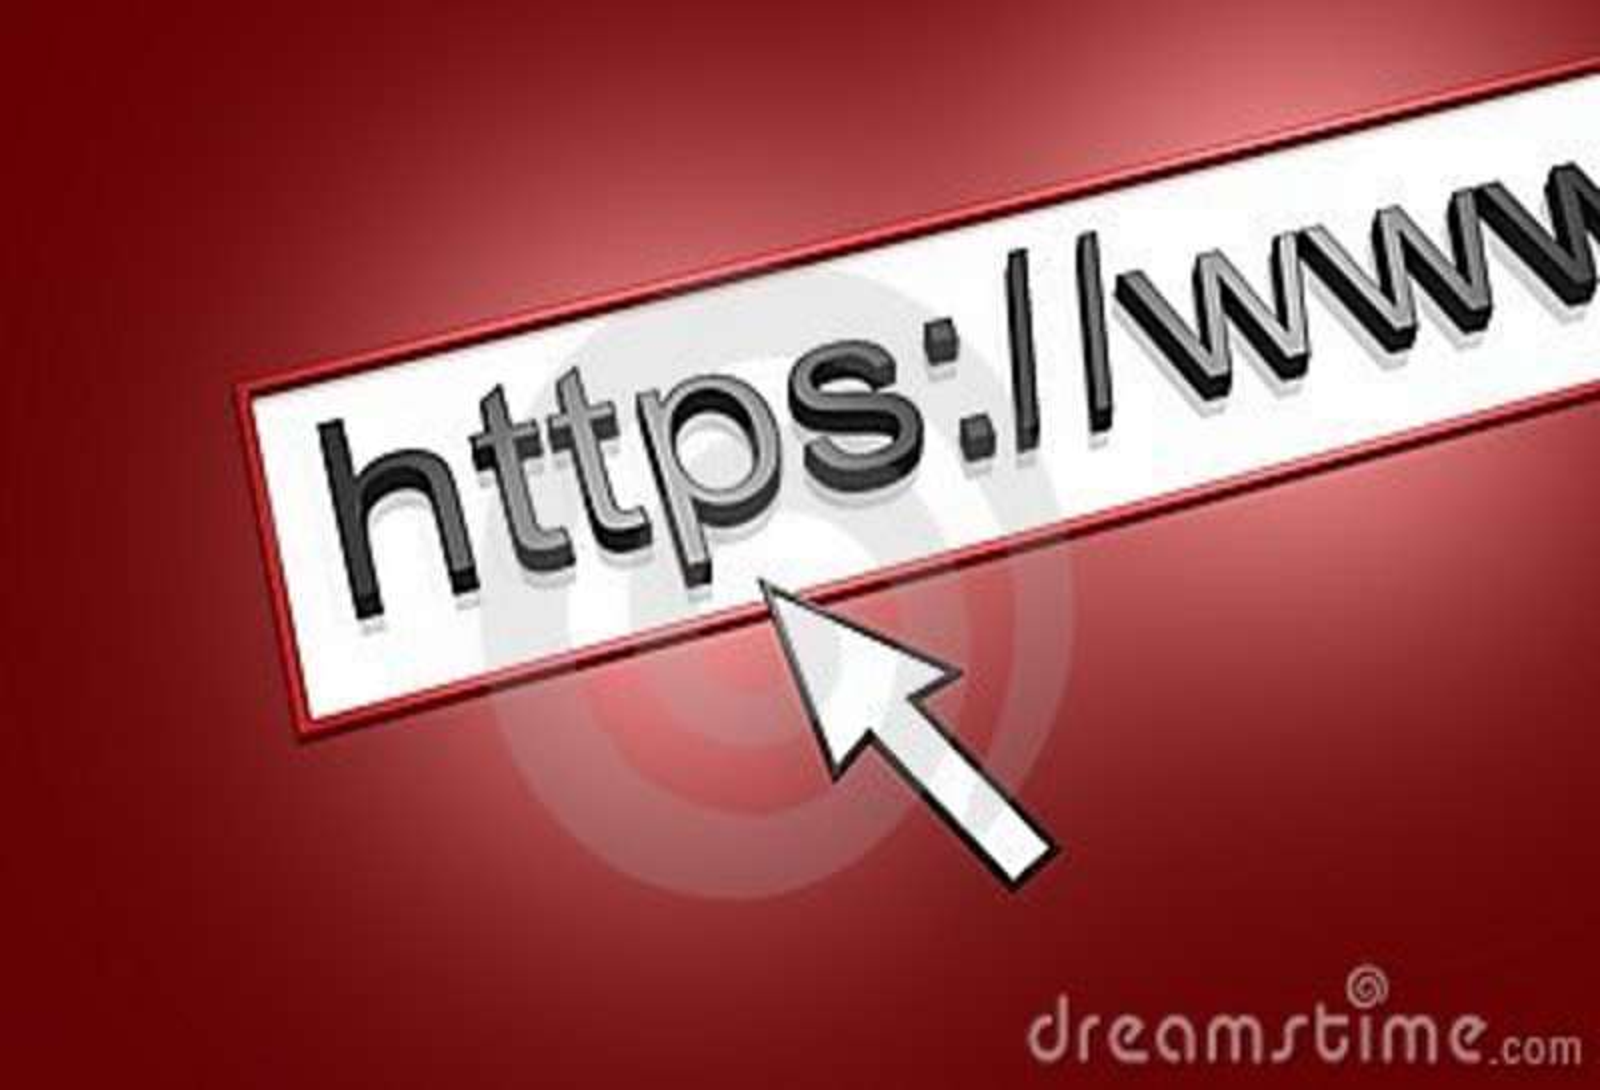 Web Address Http Stock Photo - Image: 6481710